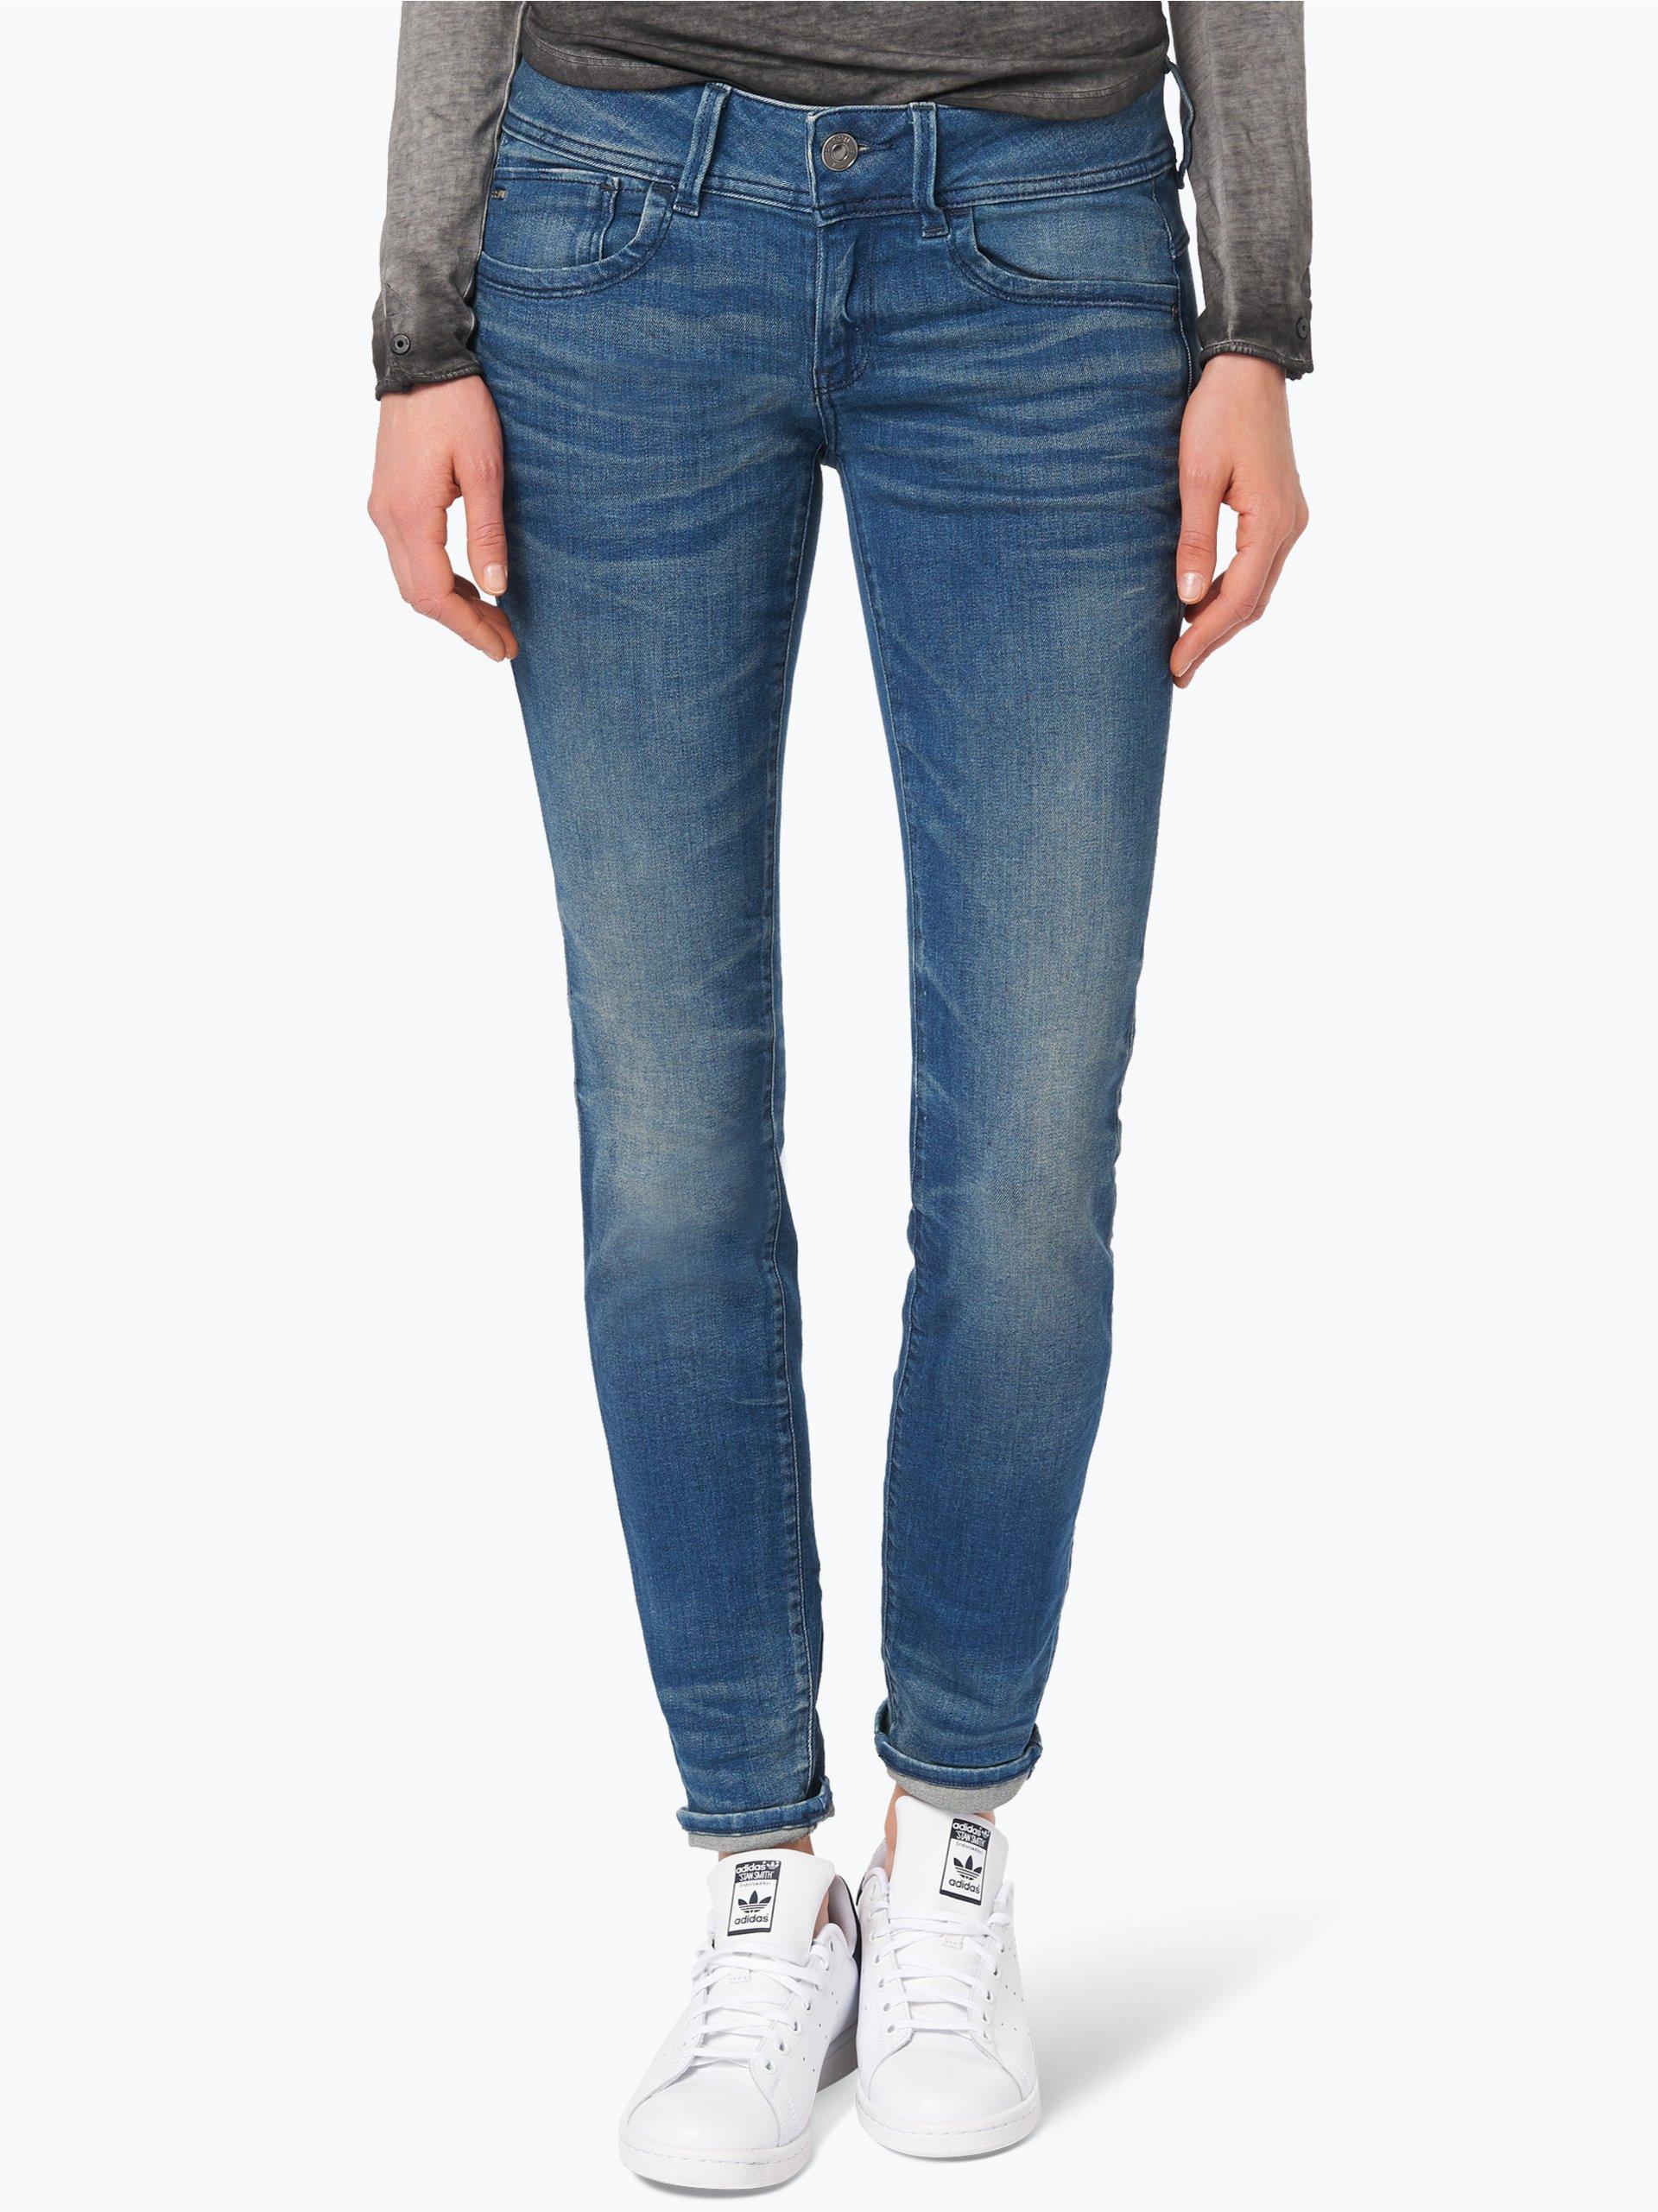 g star damen jeans lynn blau uni online kaufen peek. Black Bedroom Furniture Sets. Home Design Ideas